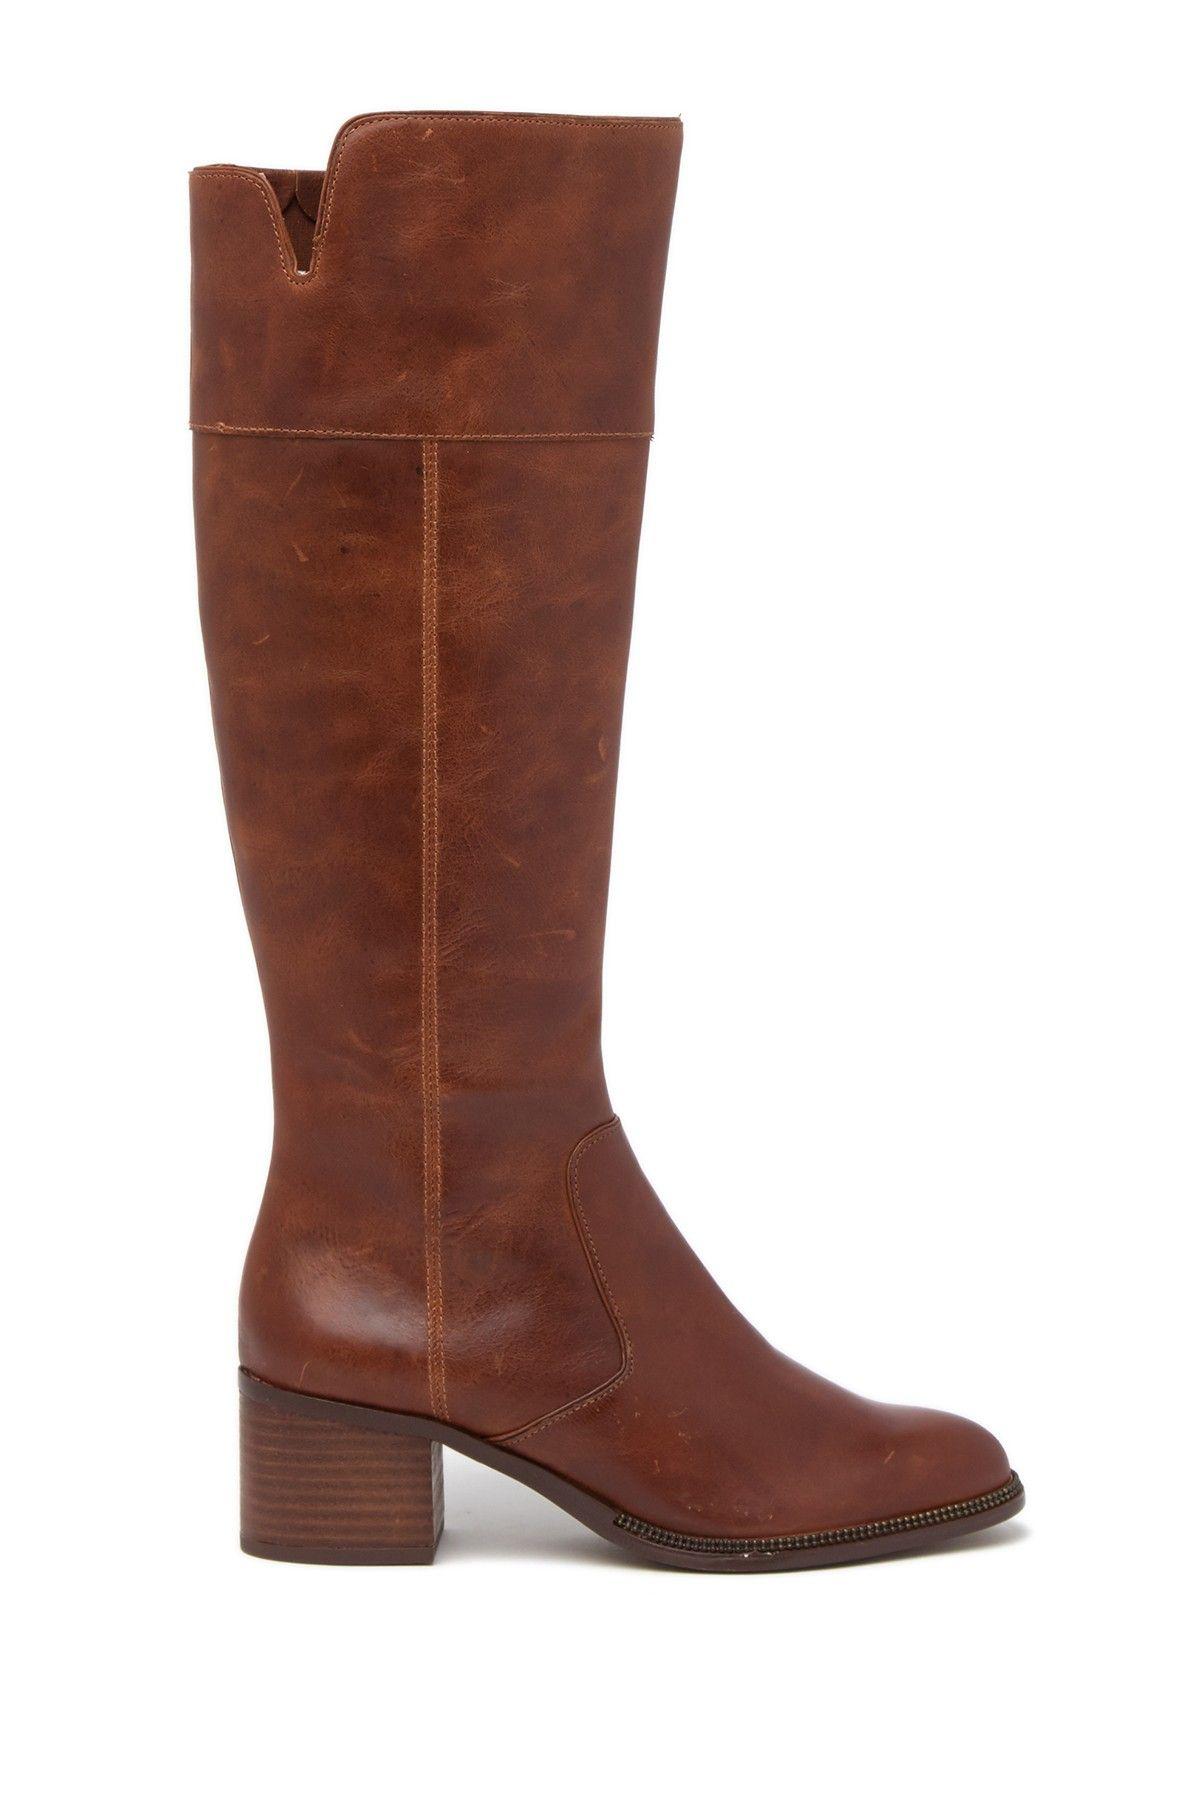 Franco Sarto | Luciana Block Heel Tall Boot #nordstromrack